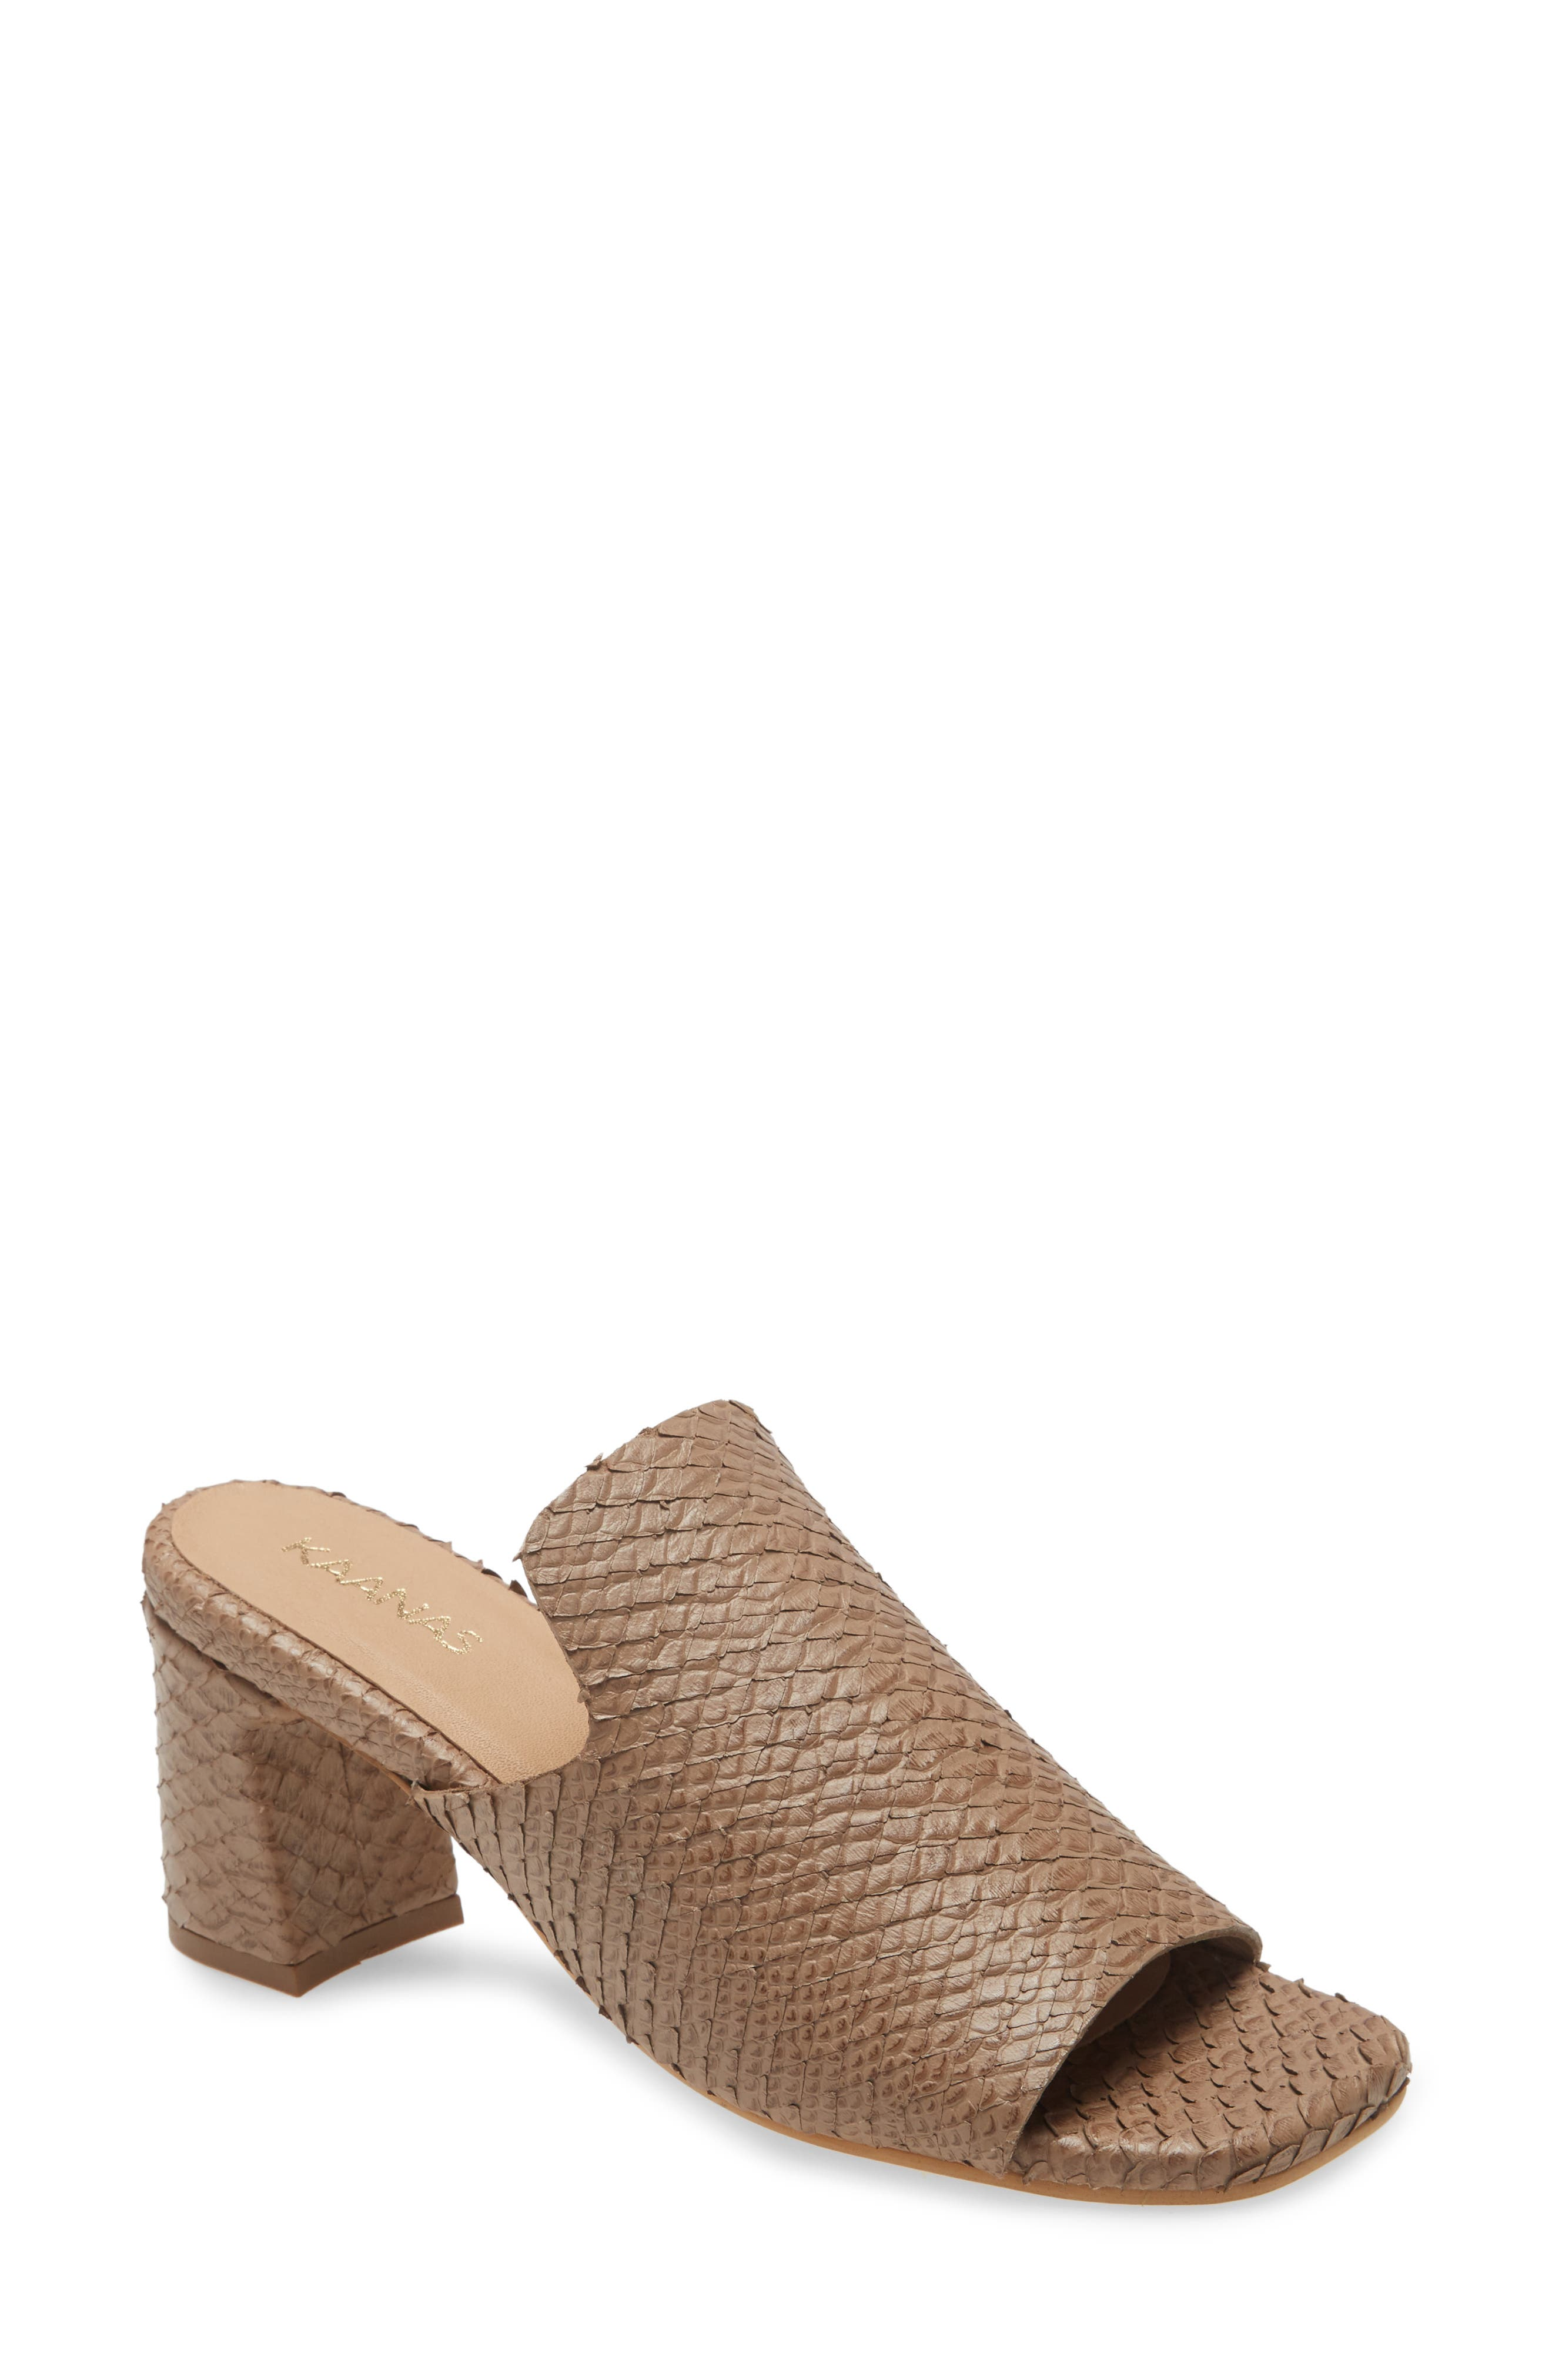 Moscow Block Heel Sandal